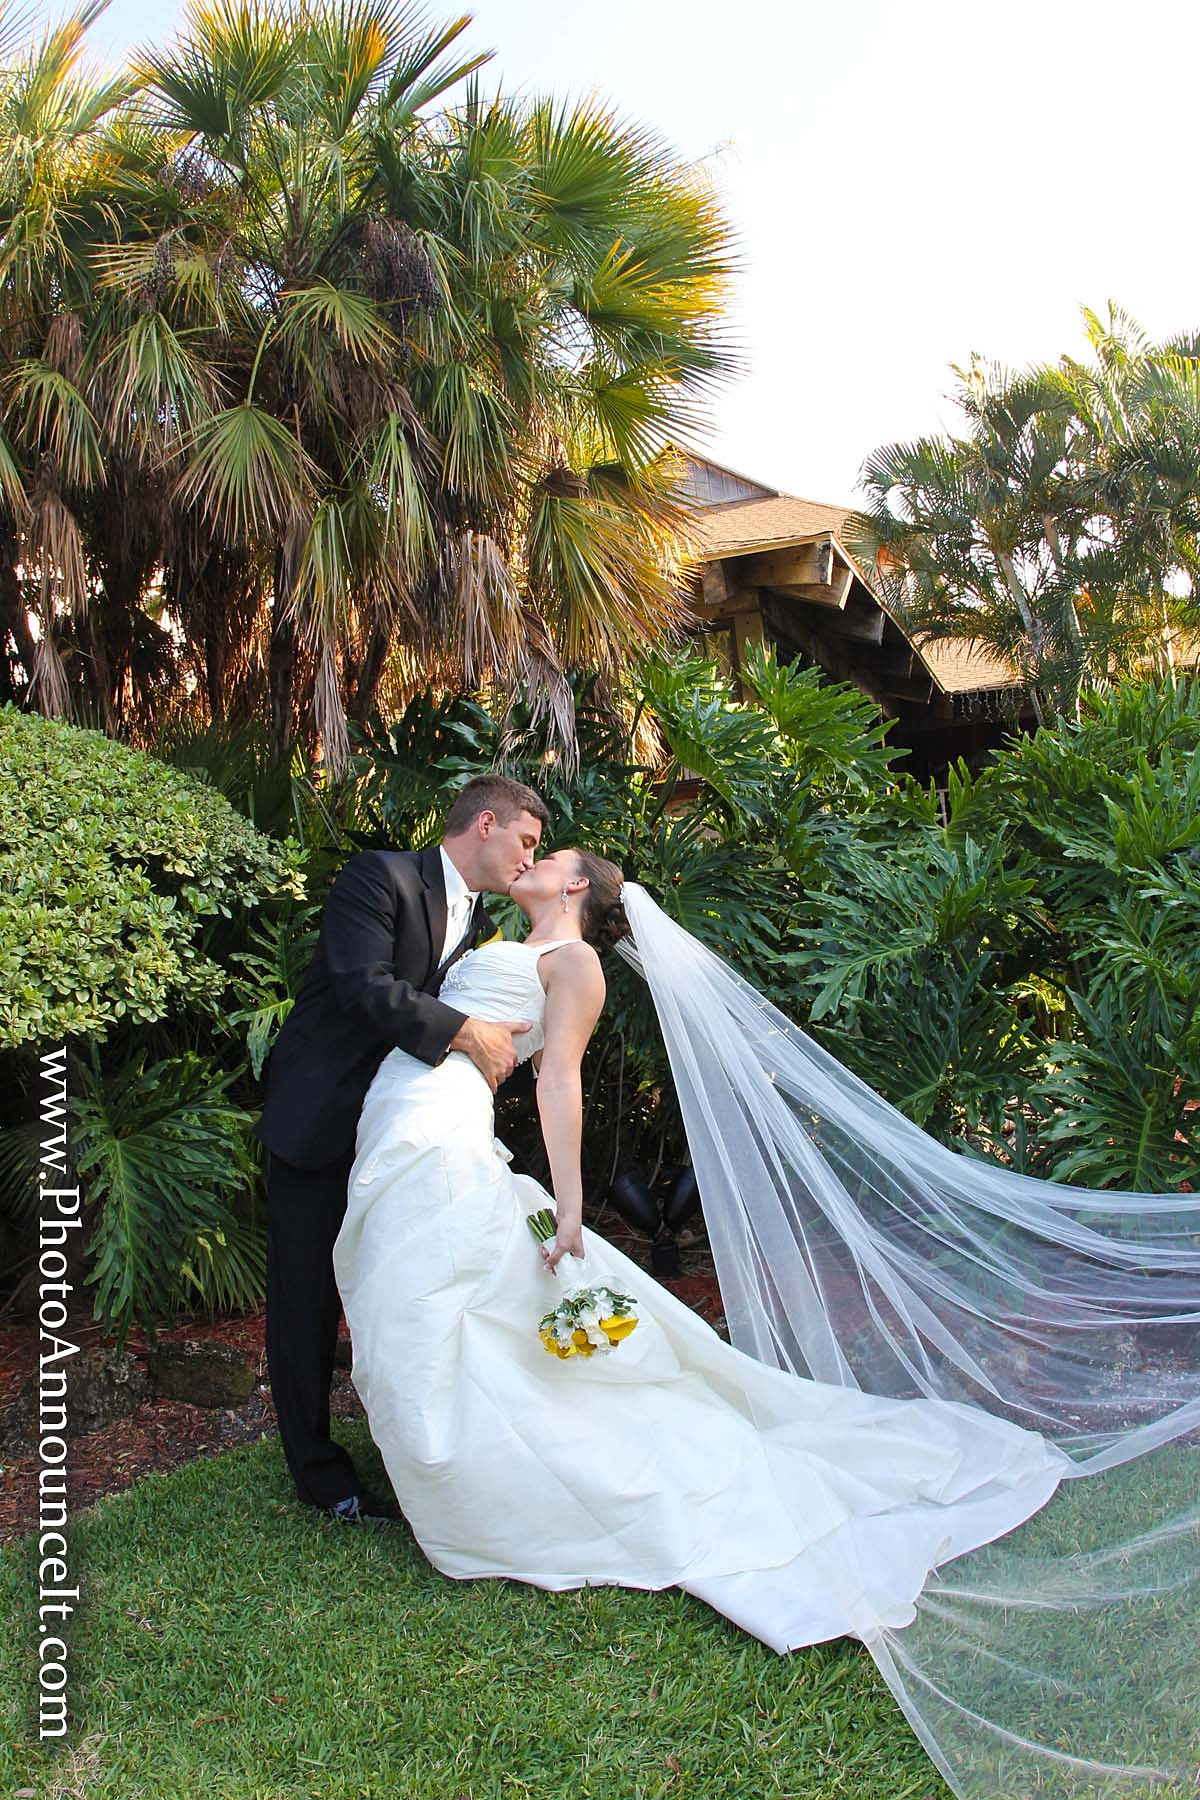 Tampa Wedding Photographer Photo Announce It Rusty Pelican Tampa Weddings